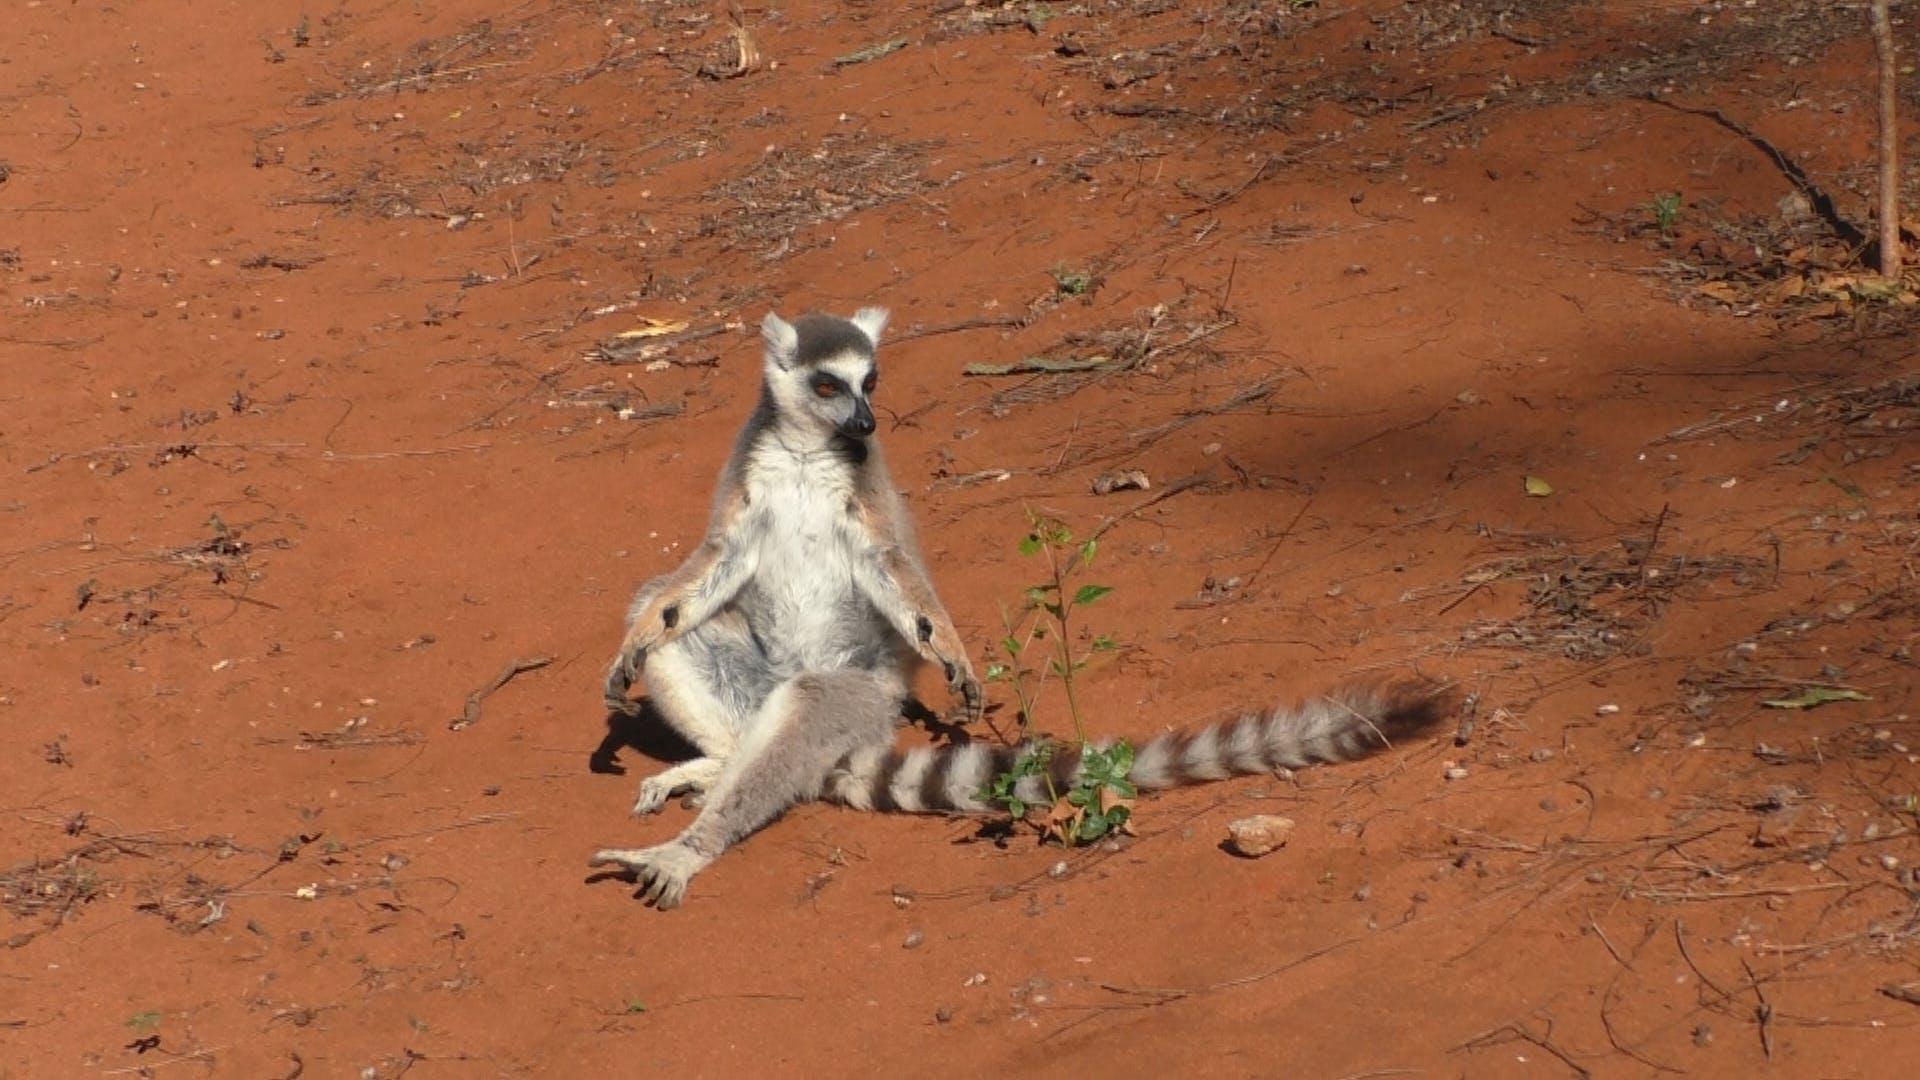 Male ring-tailed lemur showing antebrachial (wrist) glands